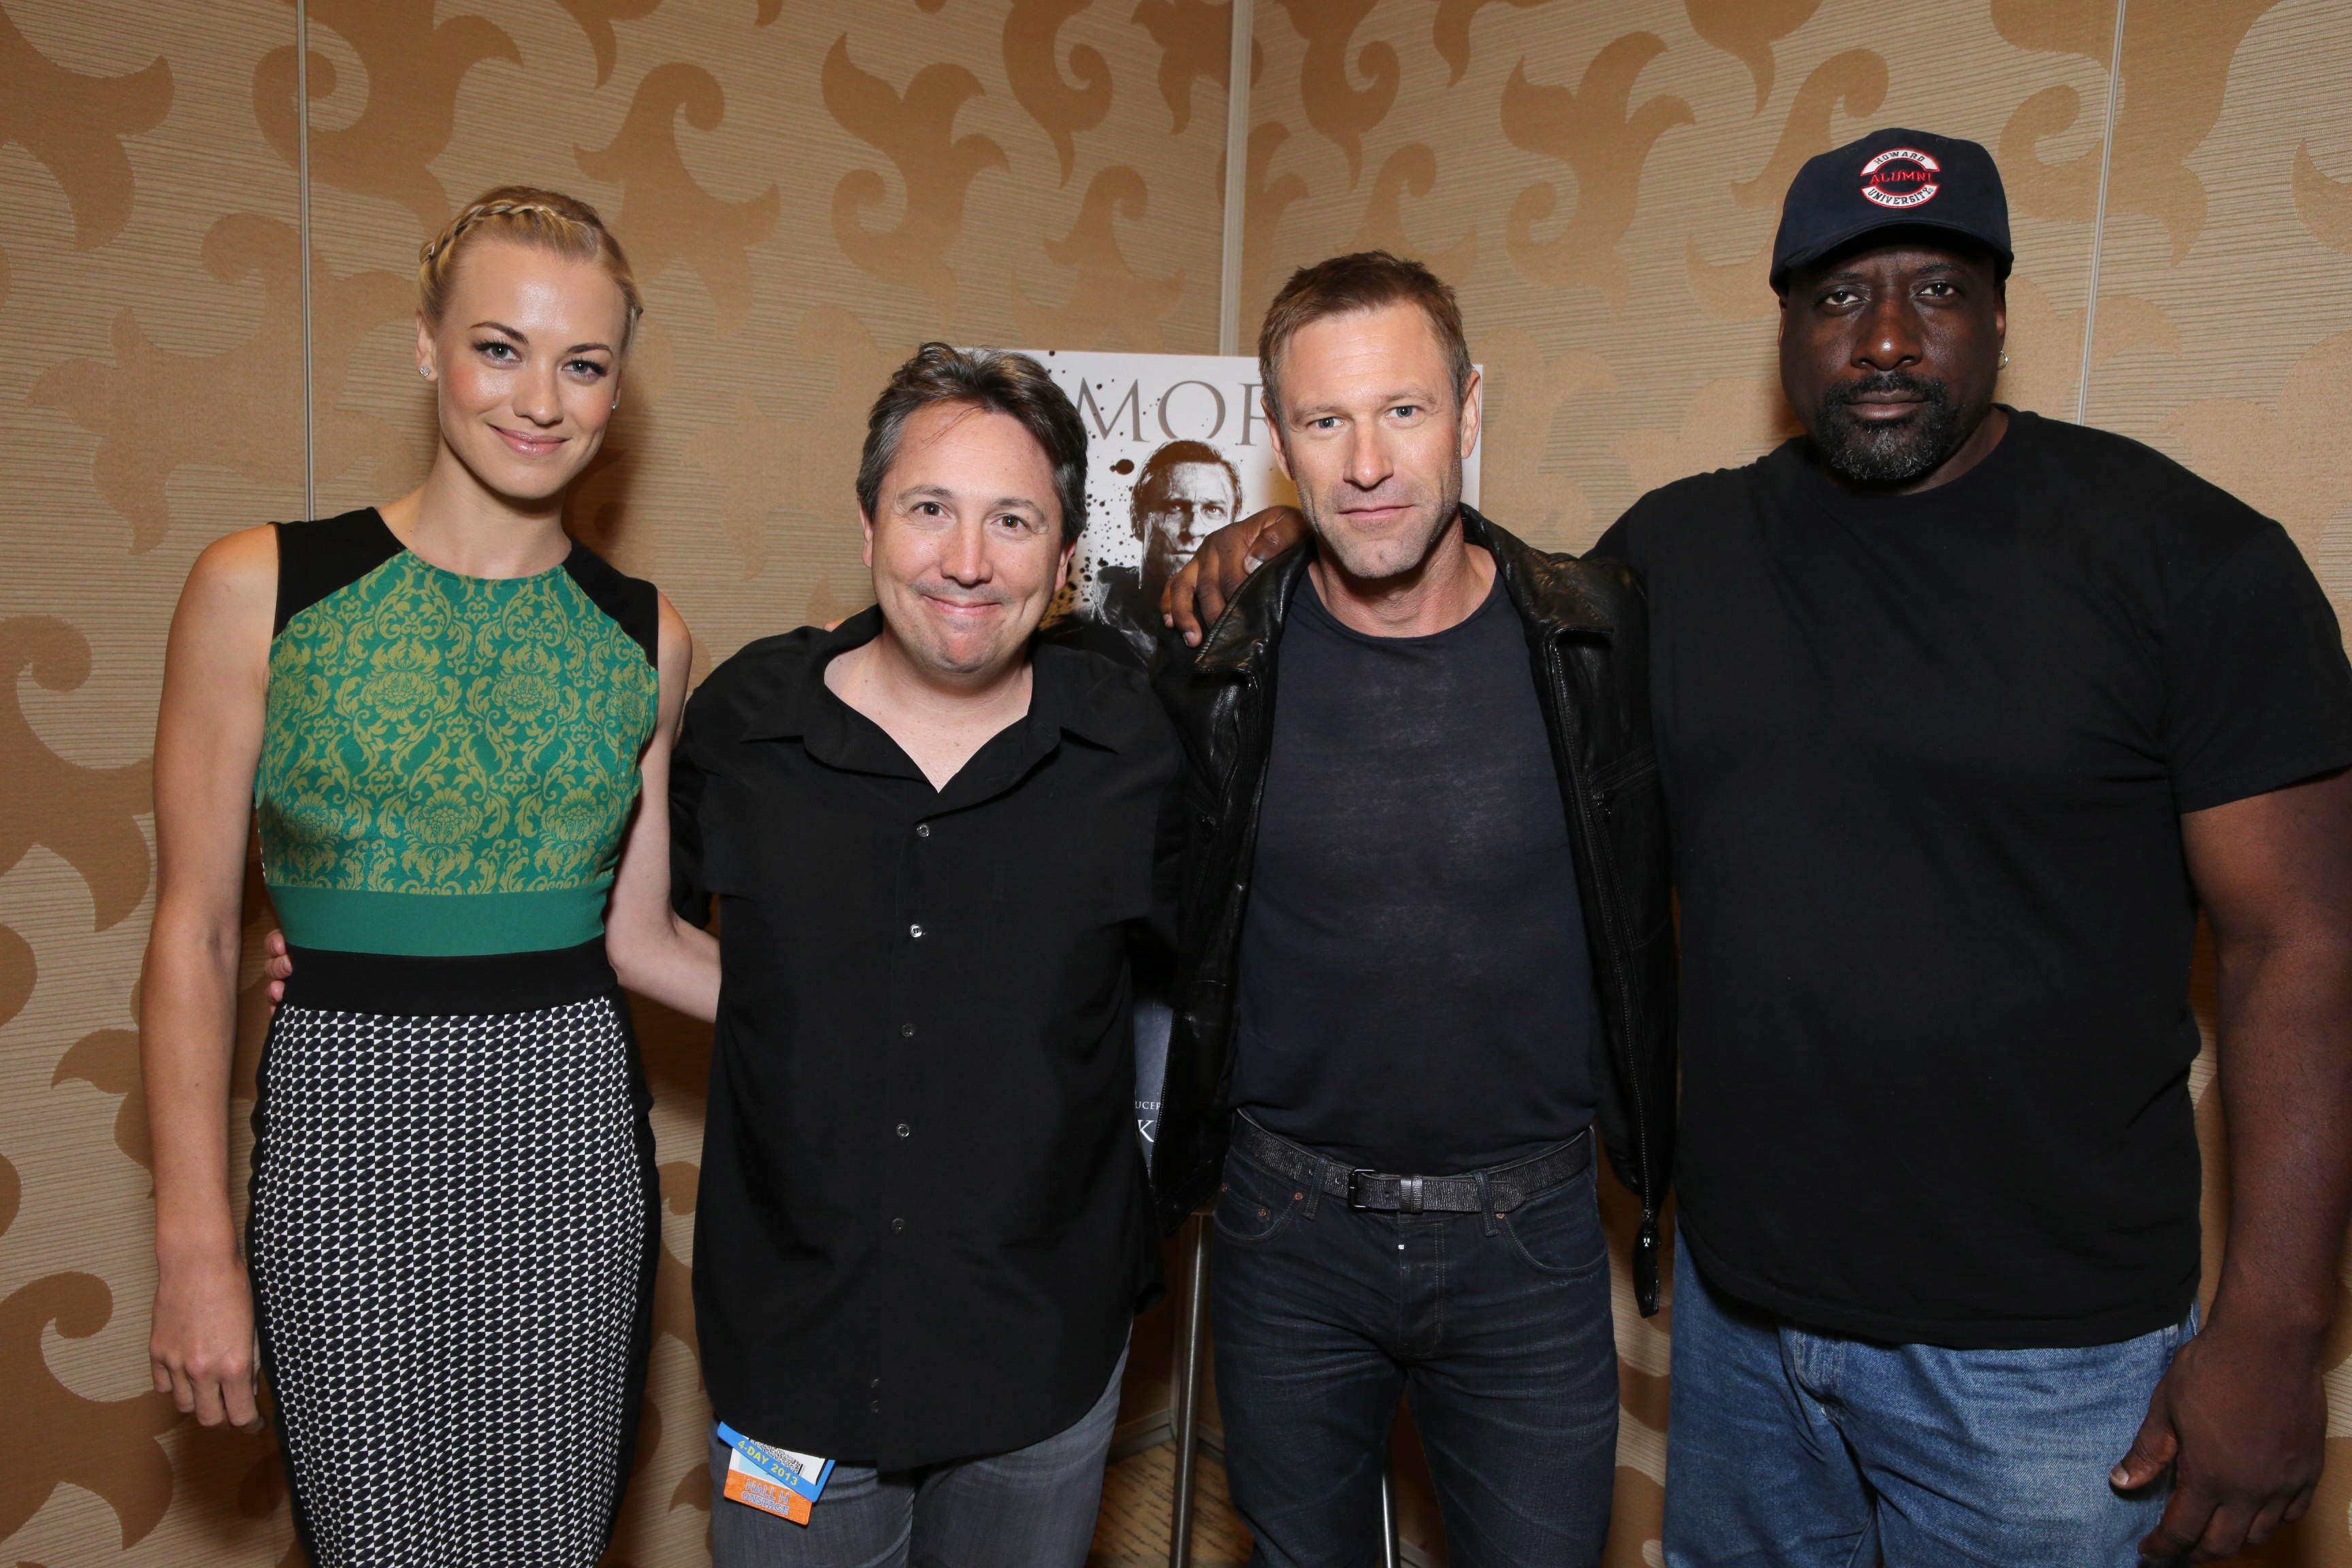 Yvonne Strahovski, Stuart Beattie, Aaron Eckhart and Kevin Grevioux at Lionsgate I, Frankenstein San Diego Comic-Con Presentation